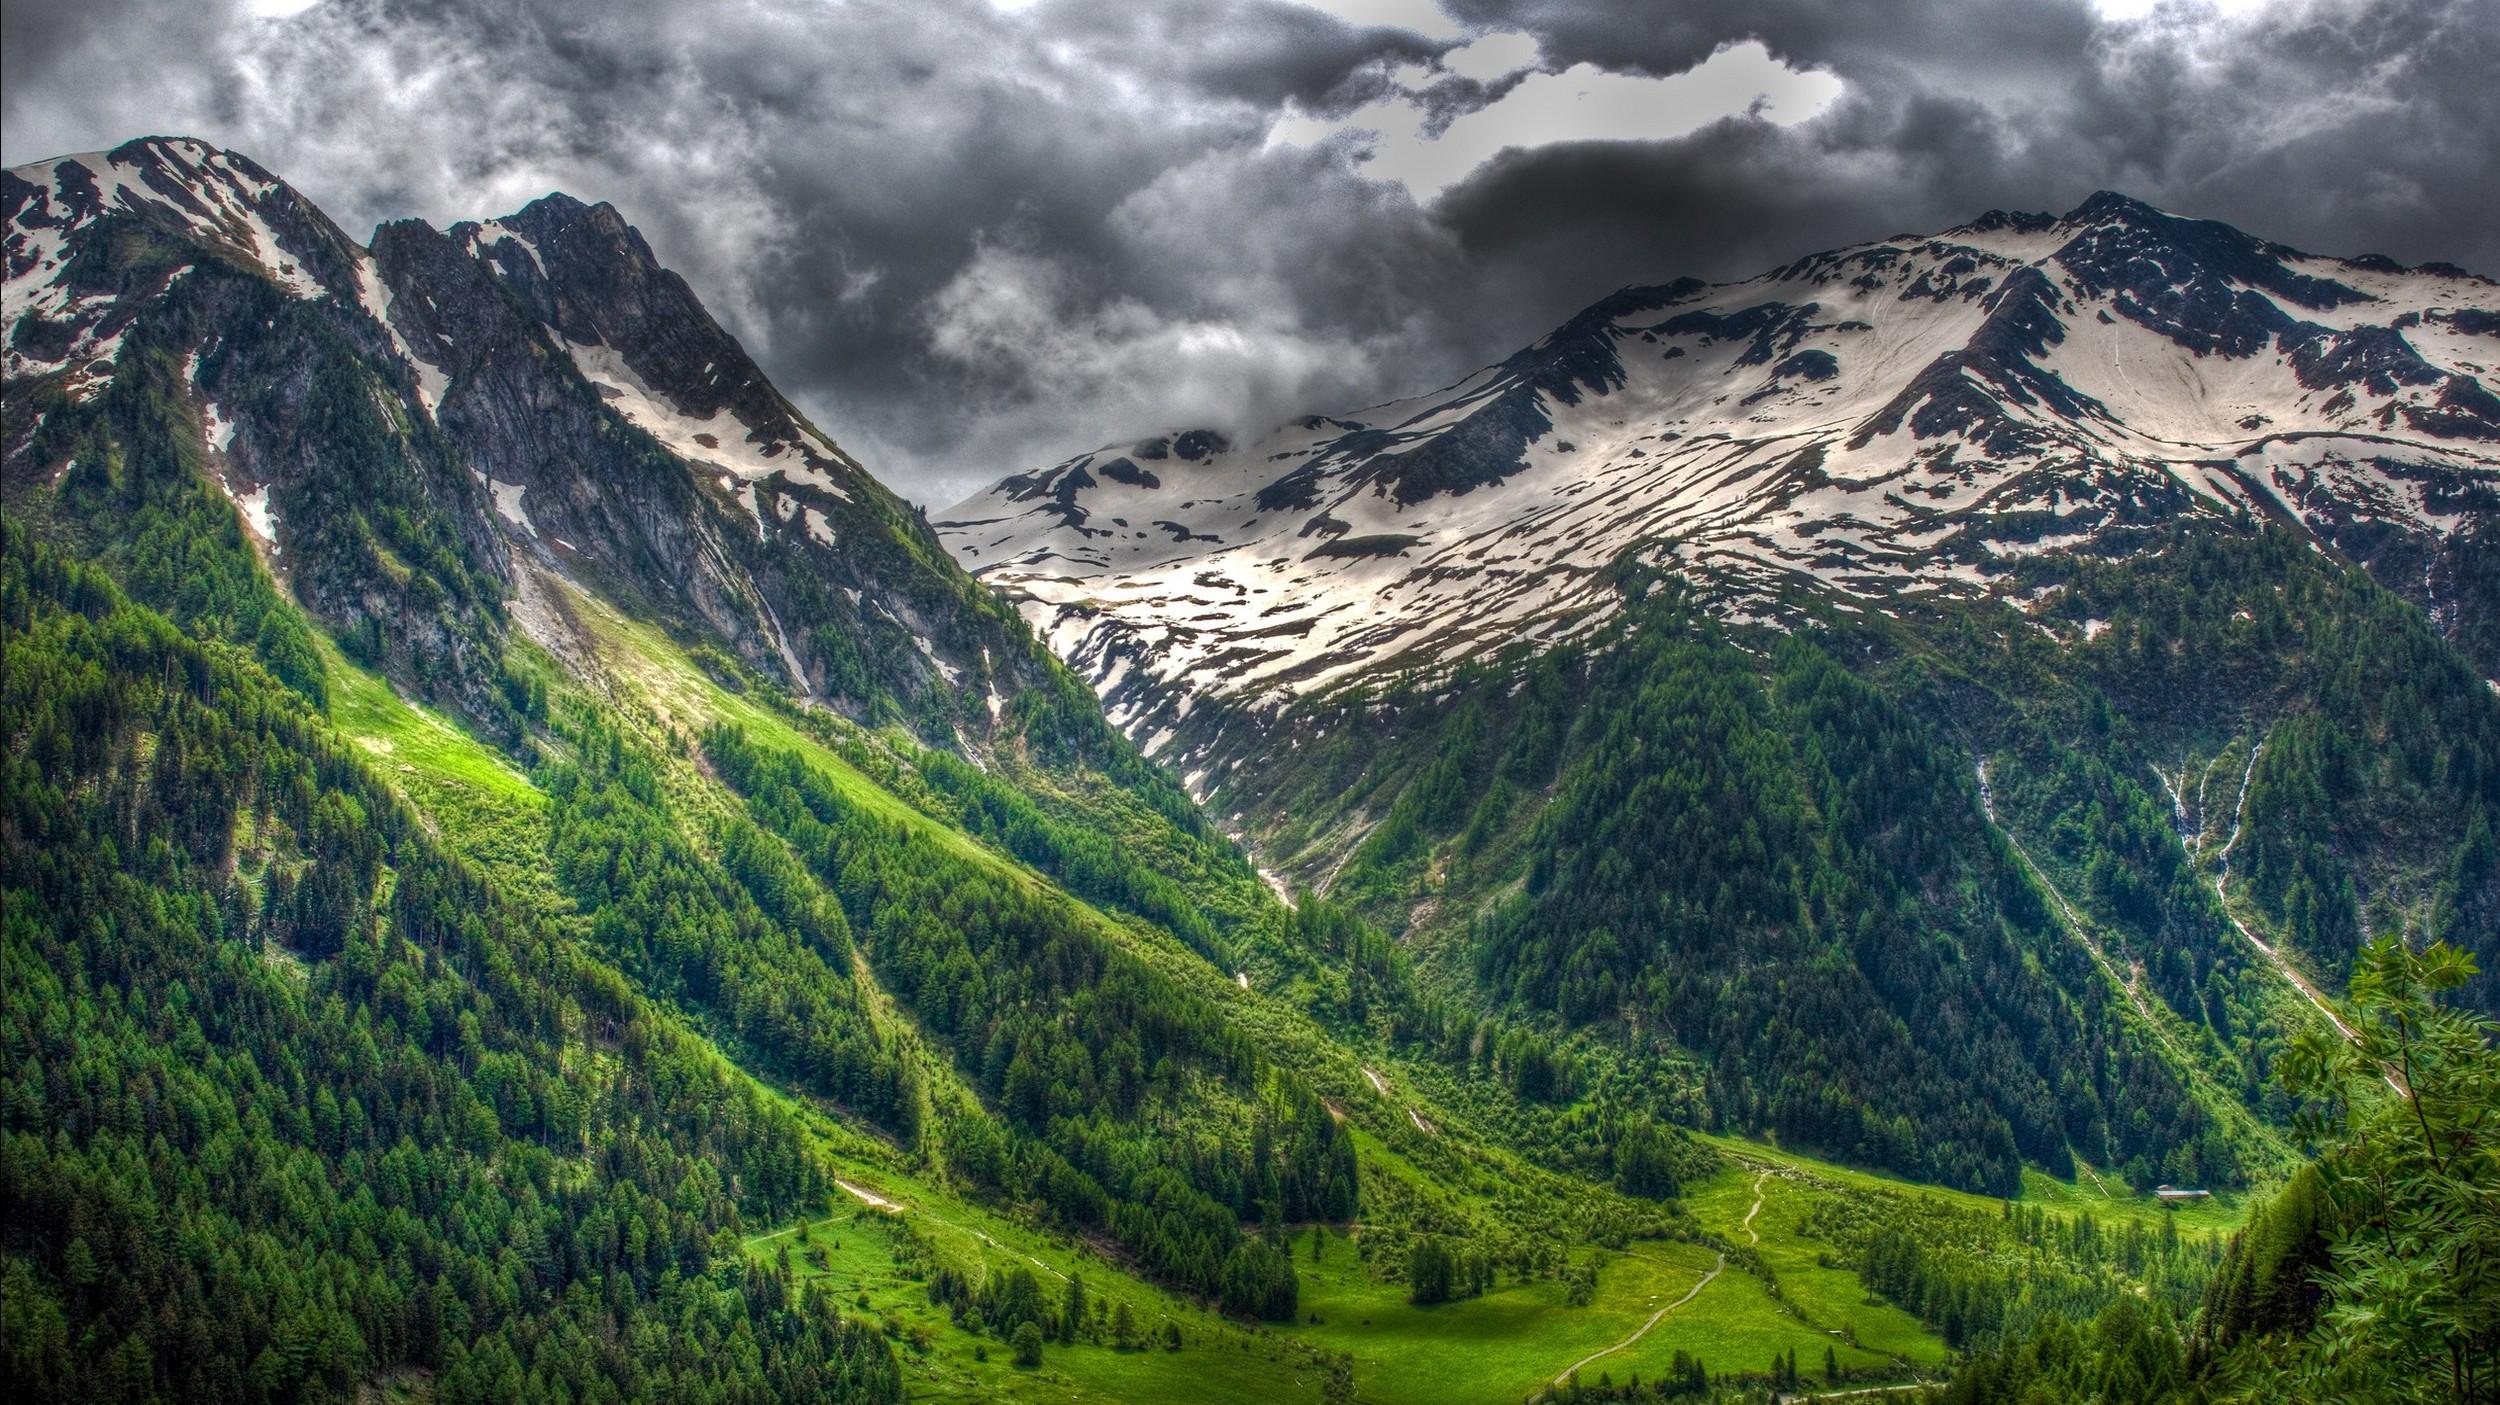 Wallpaper : landscape, forest, hill, lake, nature, clouds, green, snowy  peak, valley, mountain pass, wilderness, spring, Swiss Alps, plateau,  ridge, cloud, ...